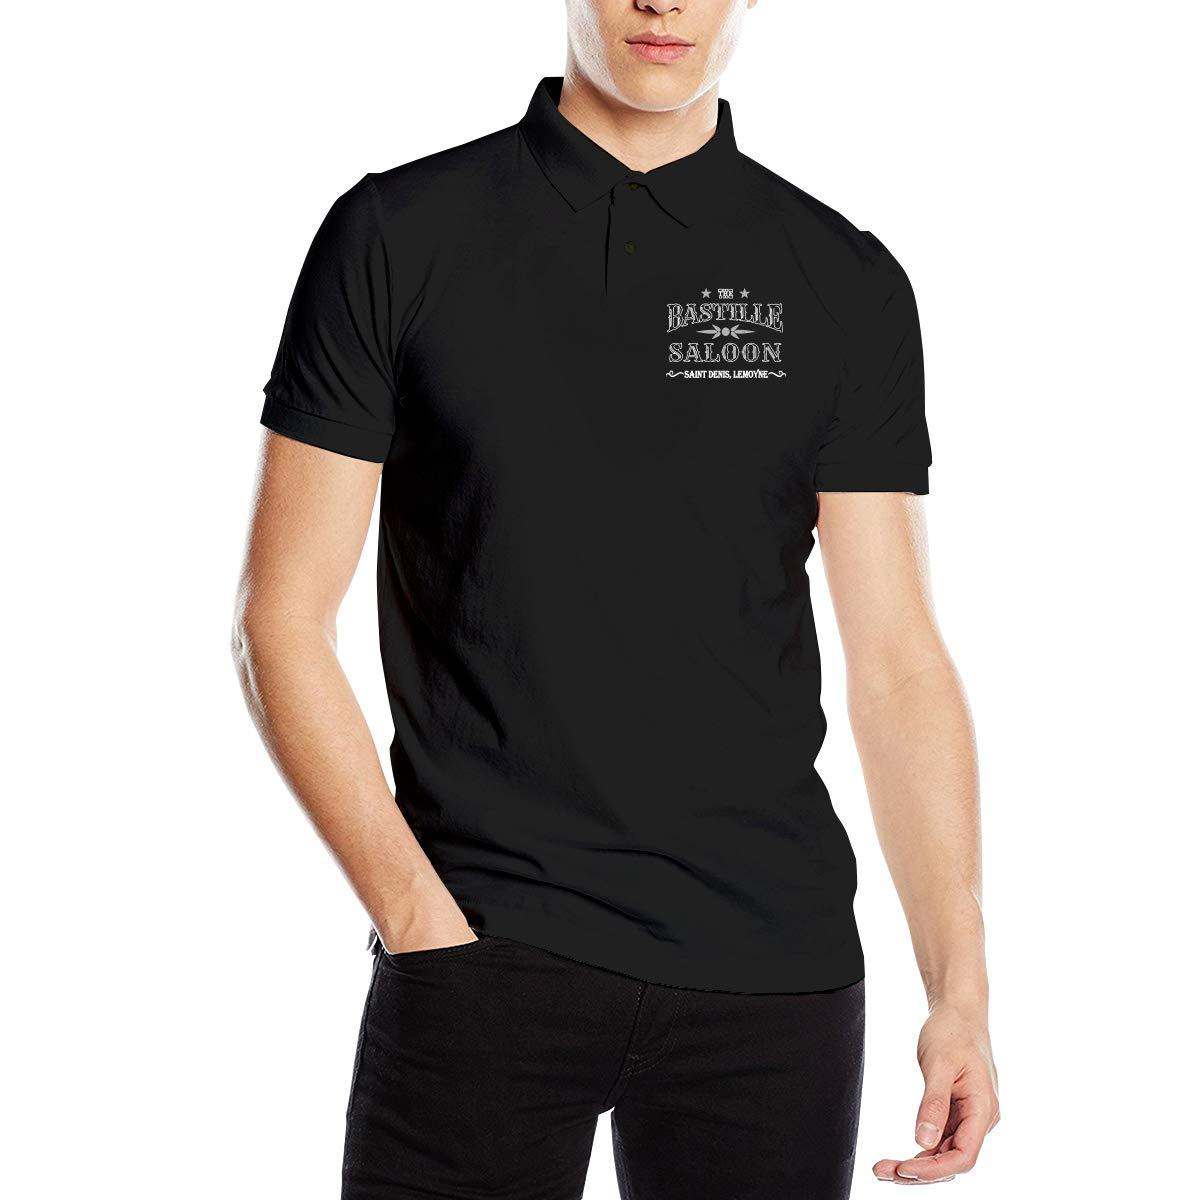 Cjlrqone The Bastille Saloon Mens Fashion Polo Shirts S Black